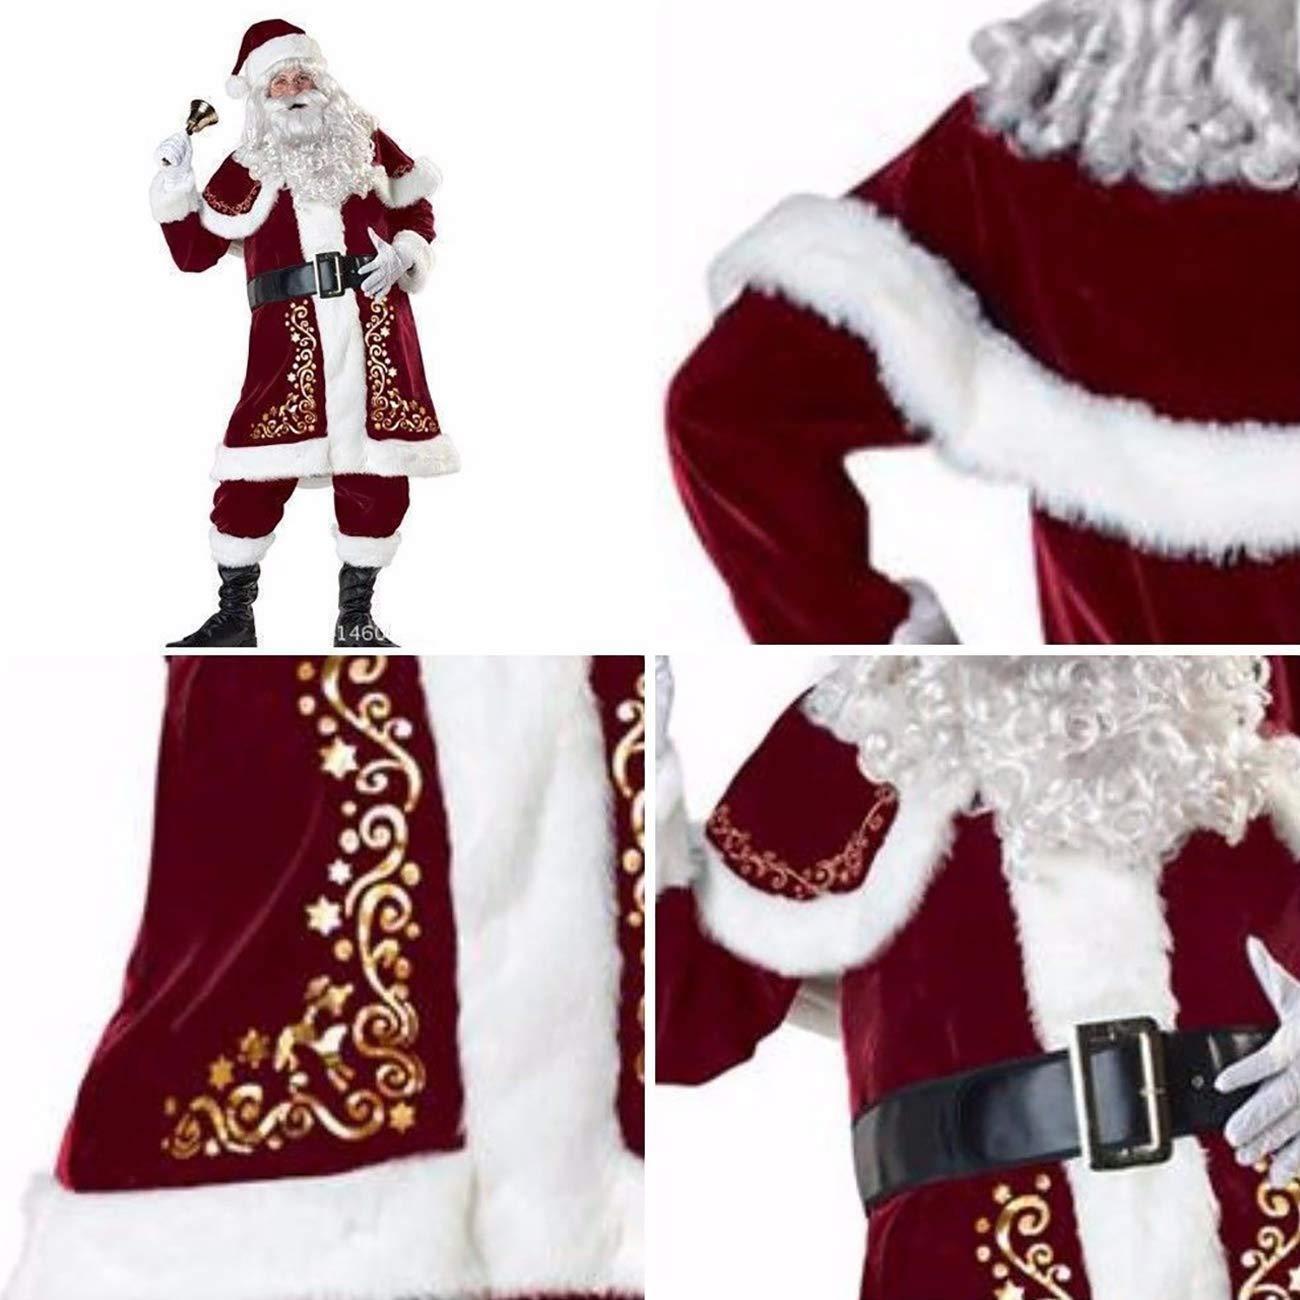 Uheng Mens Deluxe Santa Suit 7PCS Christmas Velvet Adult Santa Claus Costume Cosplay Outfit